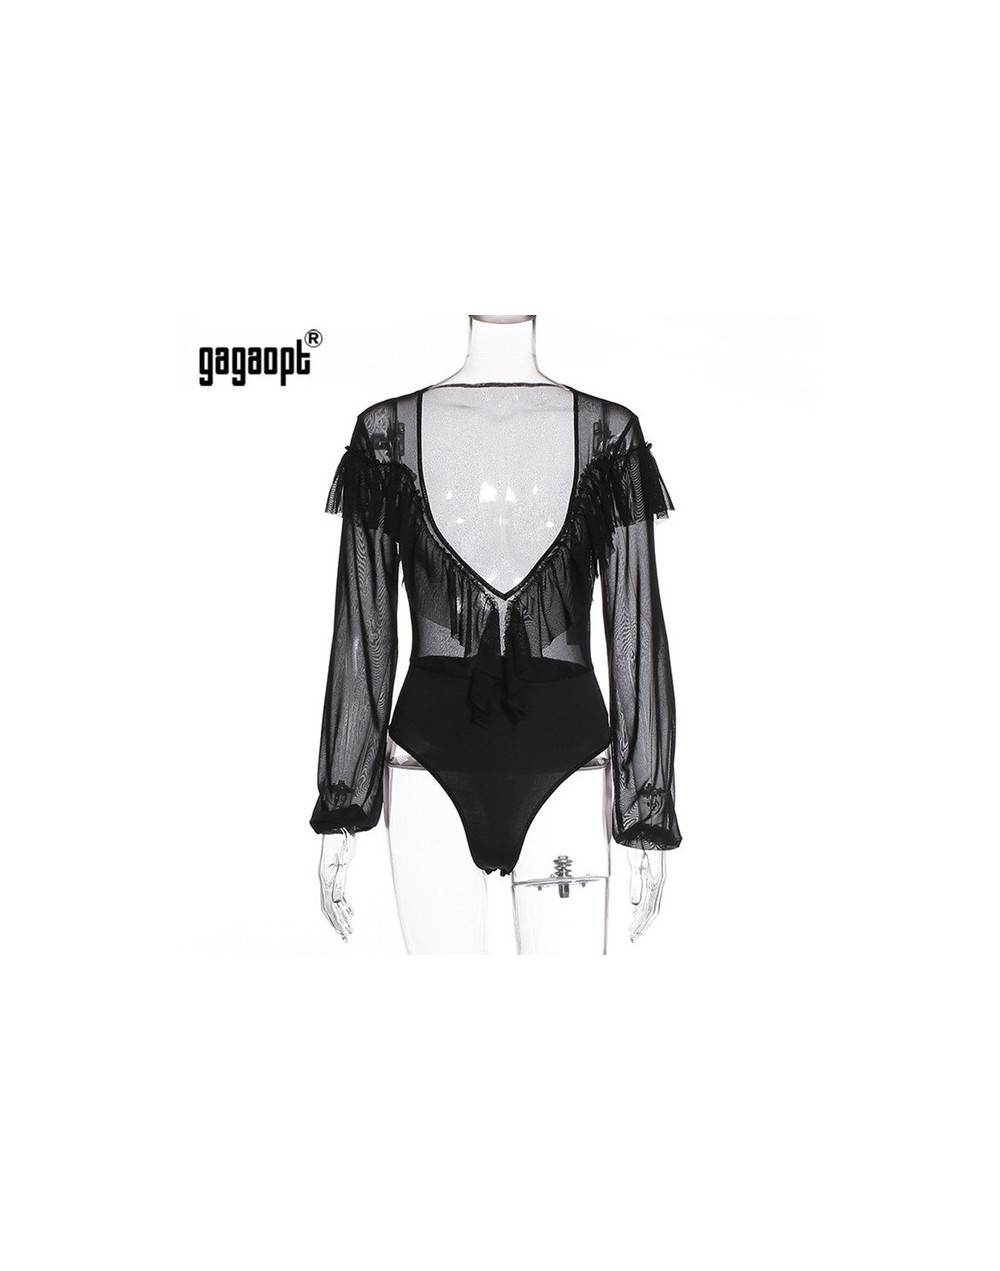 2019 Spring Lace Bodysuit Women Deep V neck Sexy Bodysuit See Through Black Bodysuit Jumpsuit Overalls Streetwear - Black - ...